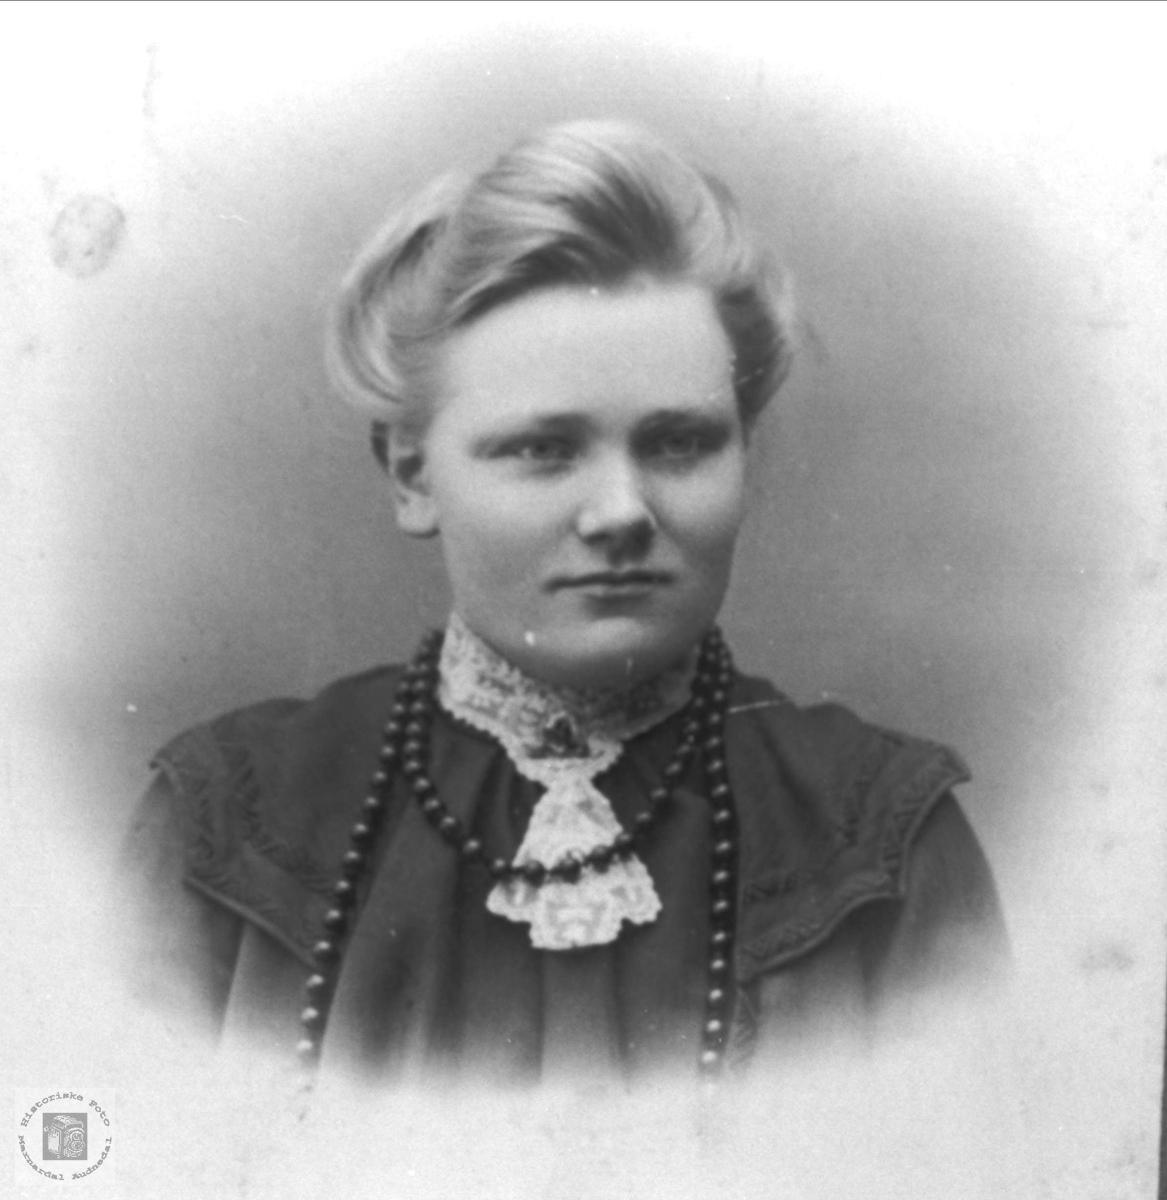 Portrett. Olaug Kvelland fra Hægeland, bosted Bjåhylen, Kleveland i Laudal.